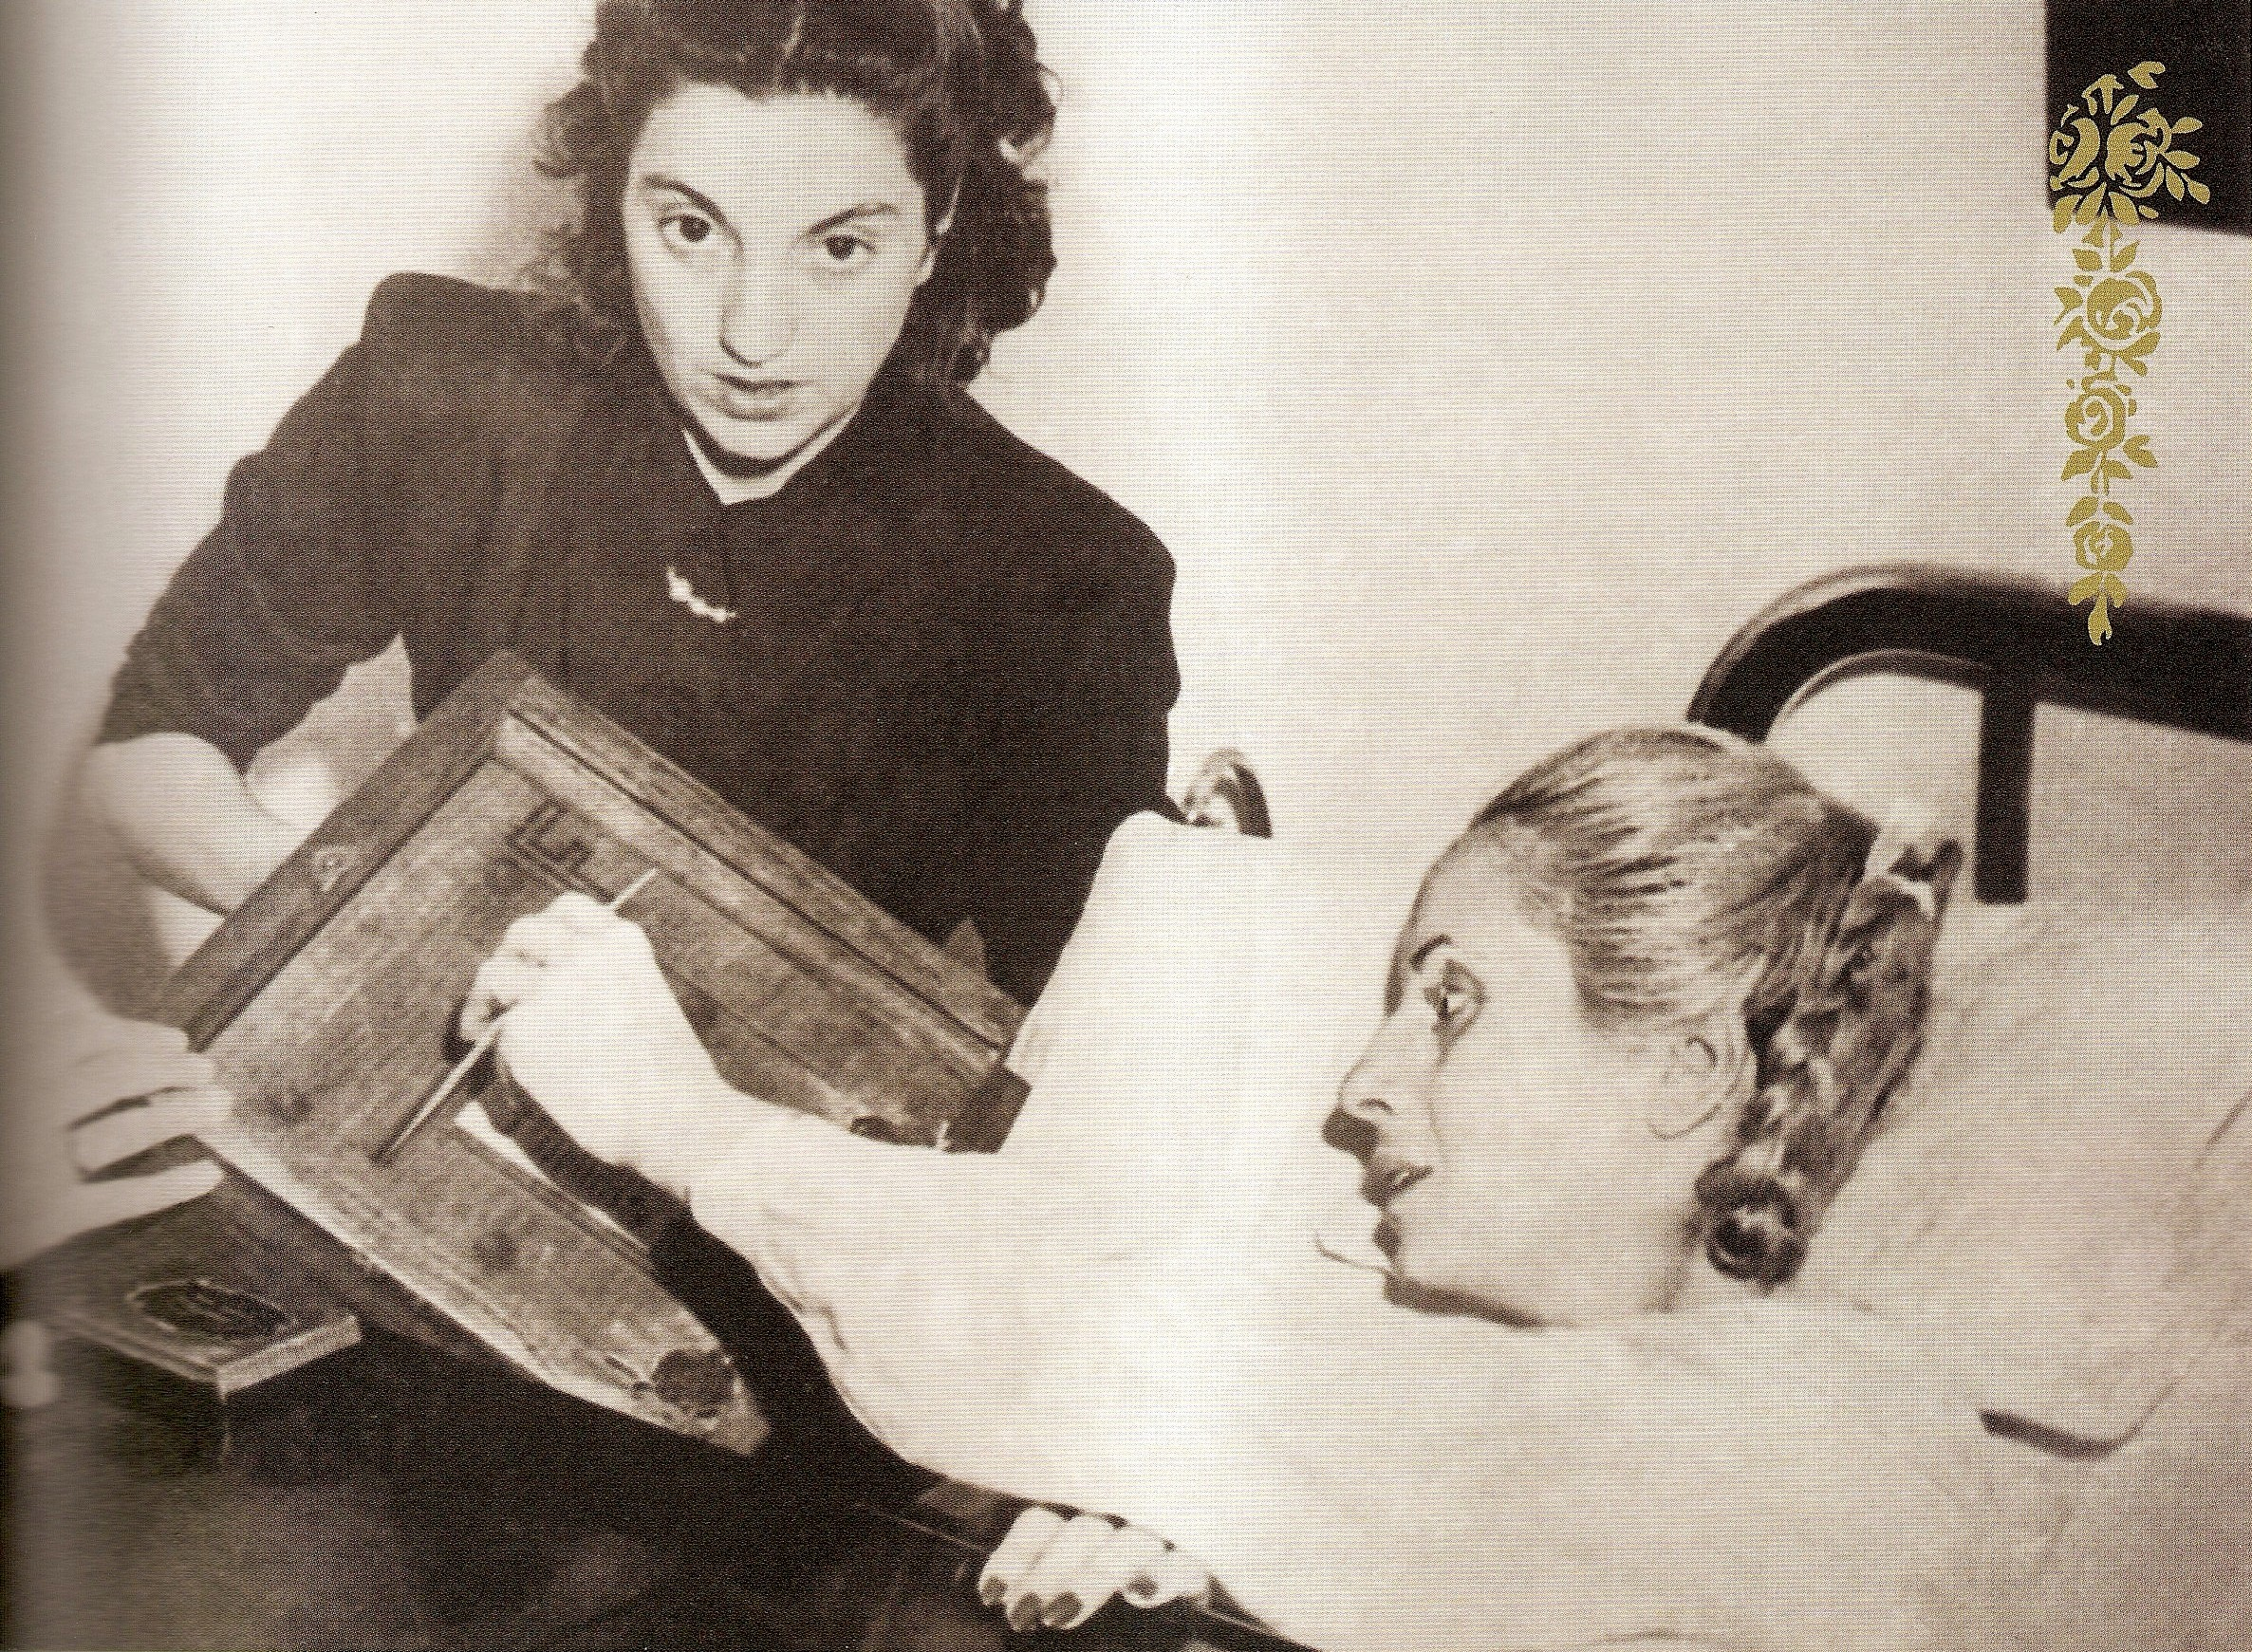 a short biography of eva duarte de peron Eva per n (1919-1952) actress eva mar a duarte was born into a small poor village, los toldos when she was still a child she born: may 7, 1919 died: july 26, 1952 (age 33 de camisa vieja a chaqueta nueva (1982.